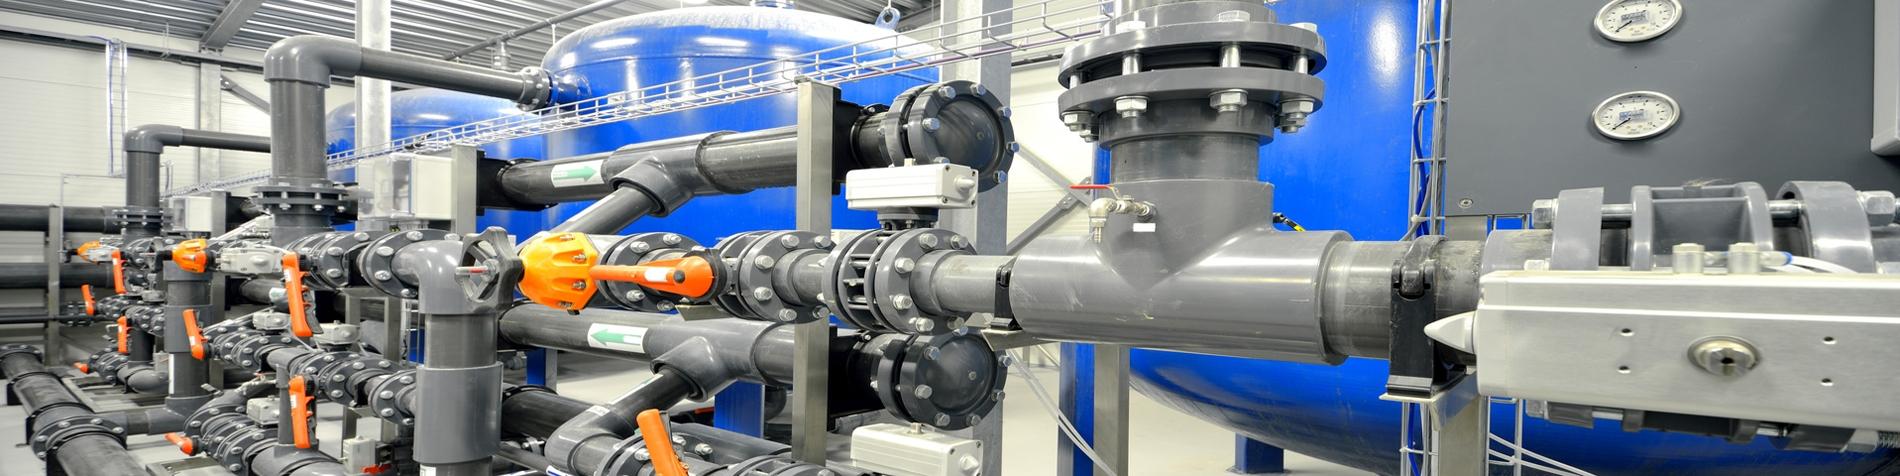 Rohrleitungssysteme (© shutterstock_ID 140272729)